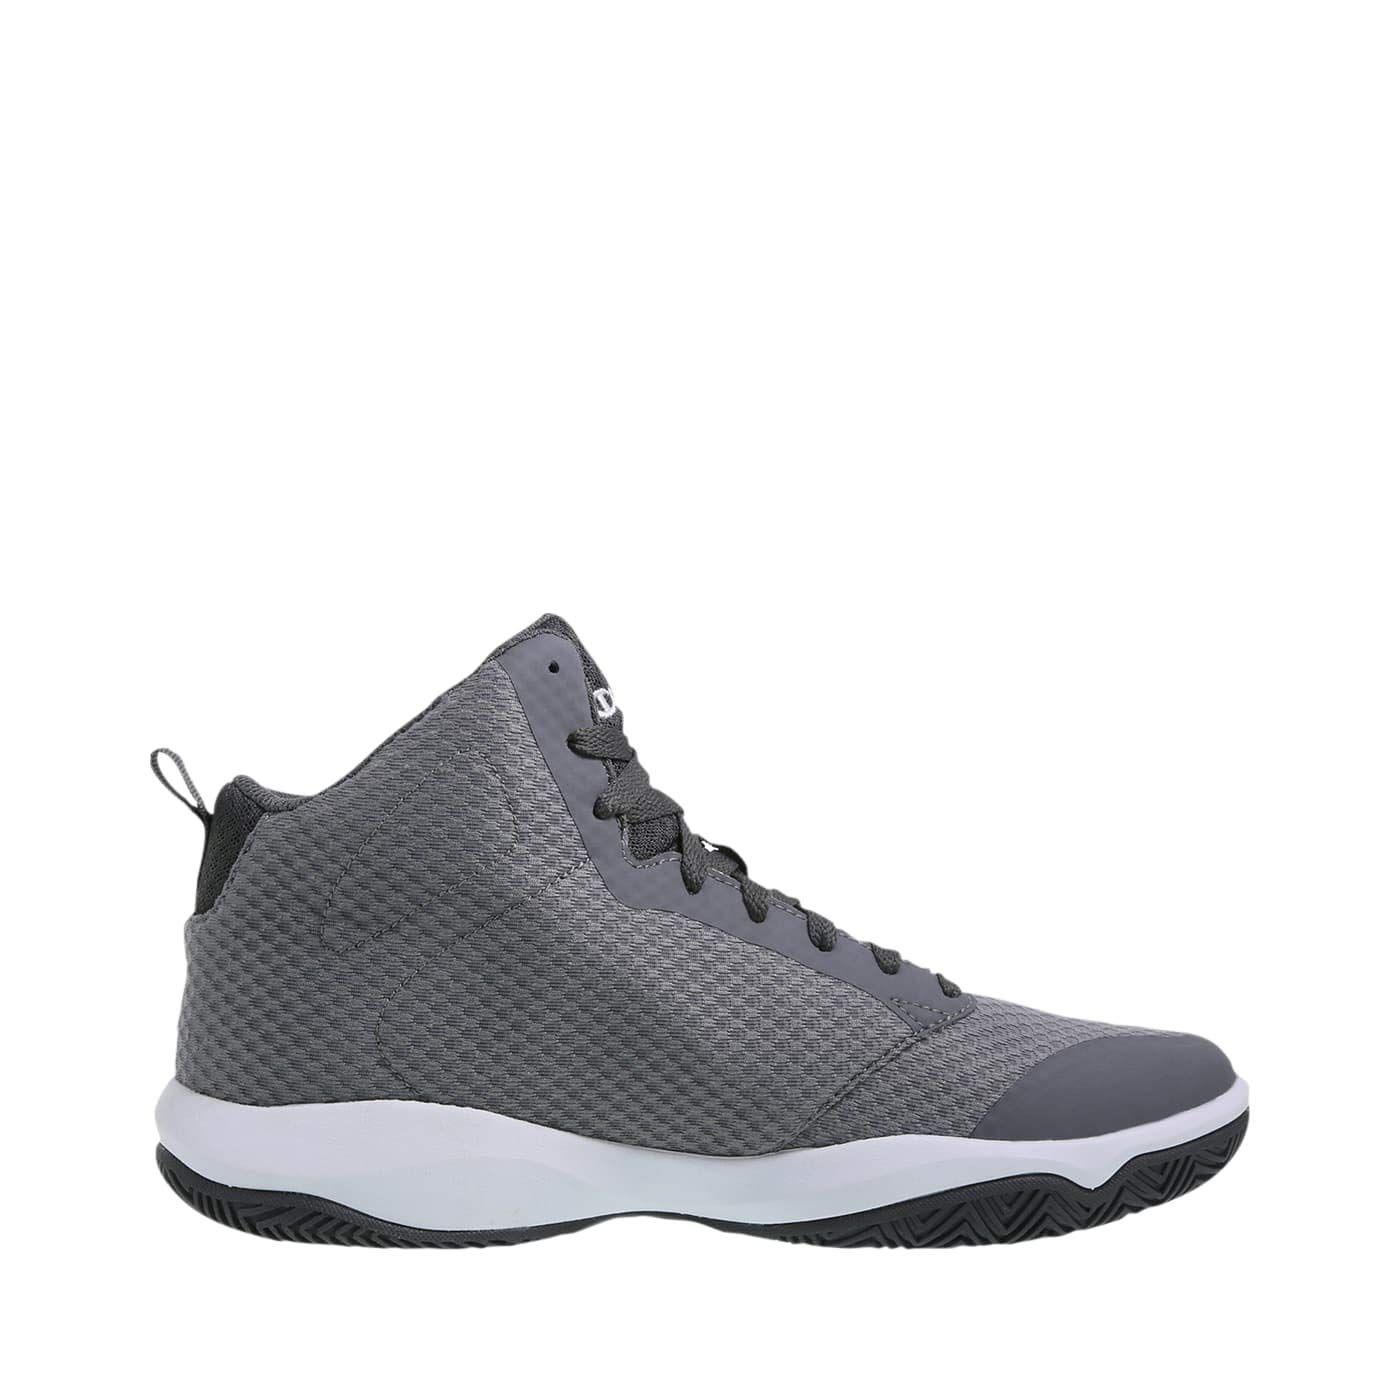 c1bc43578898a Champion Men s Inferno Basketball Shoes  Amazon.ca  Shoes   Handbags